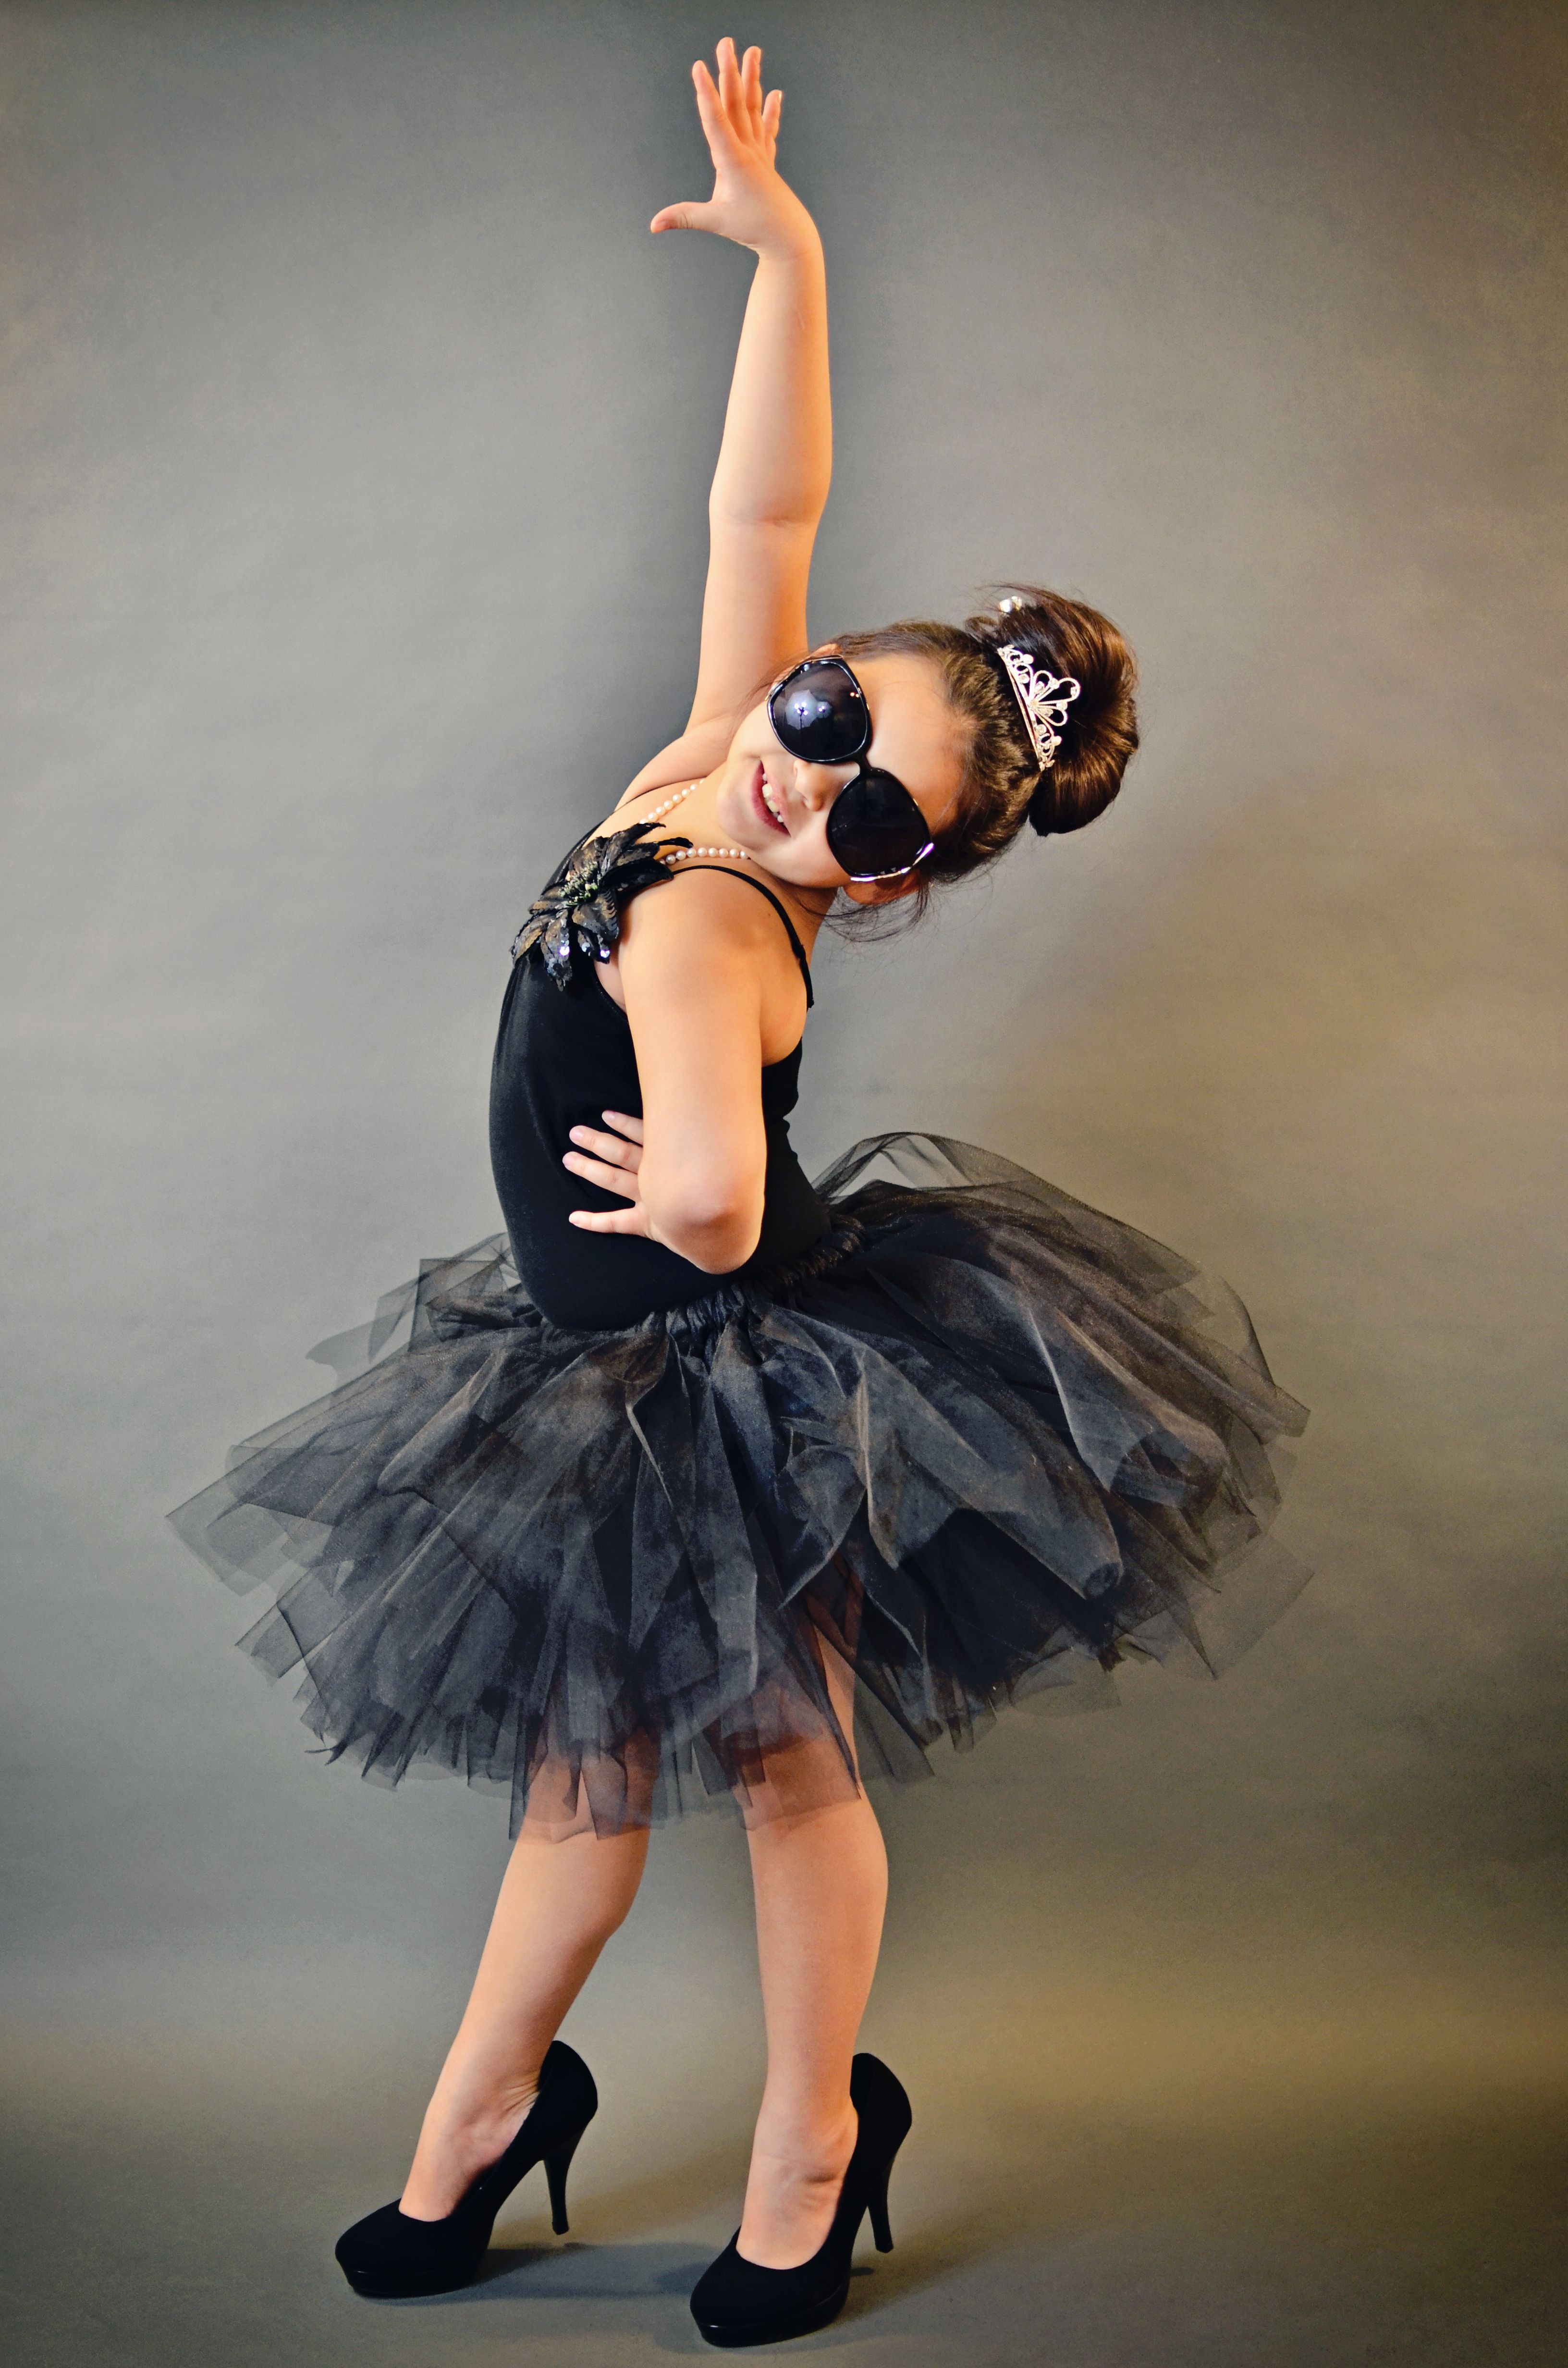 Black tutu dress dance